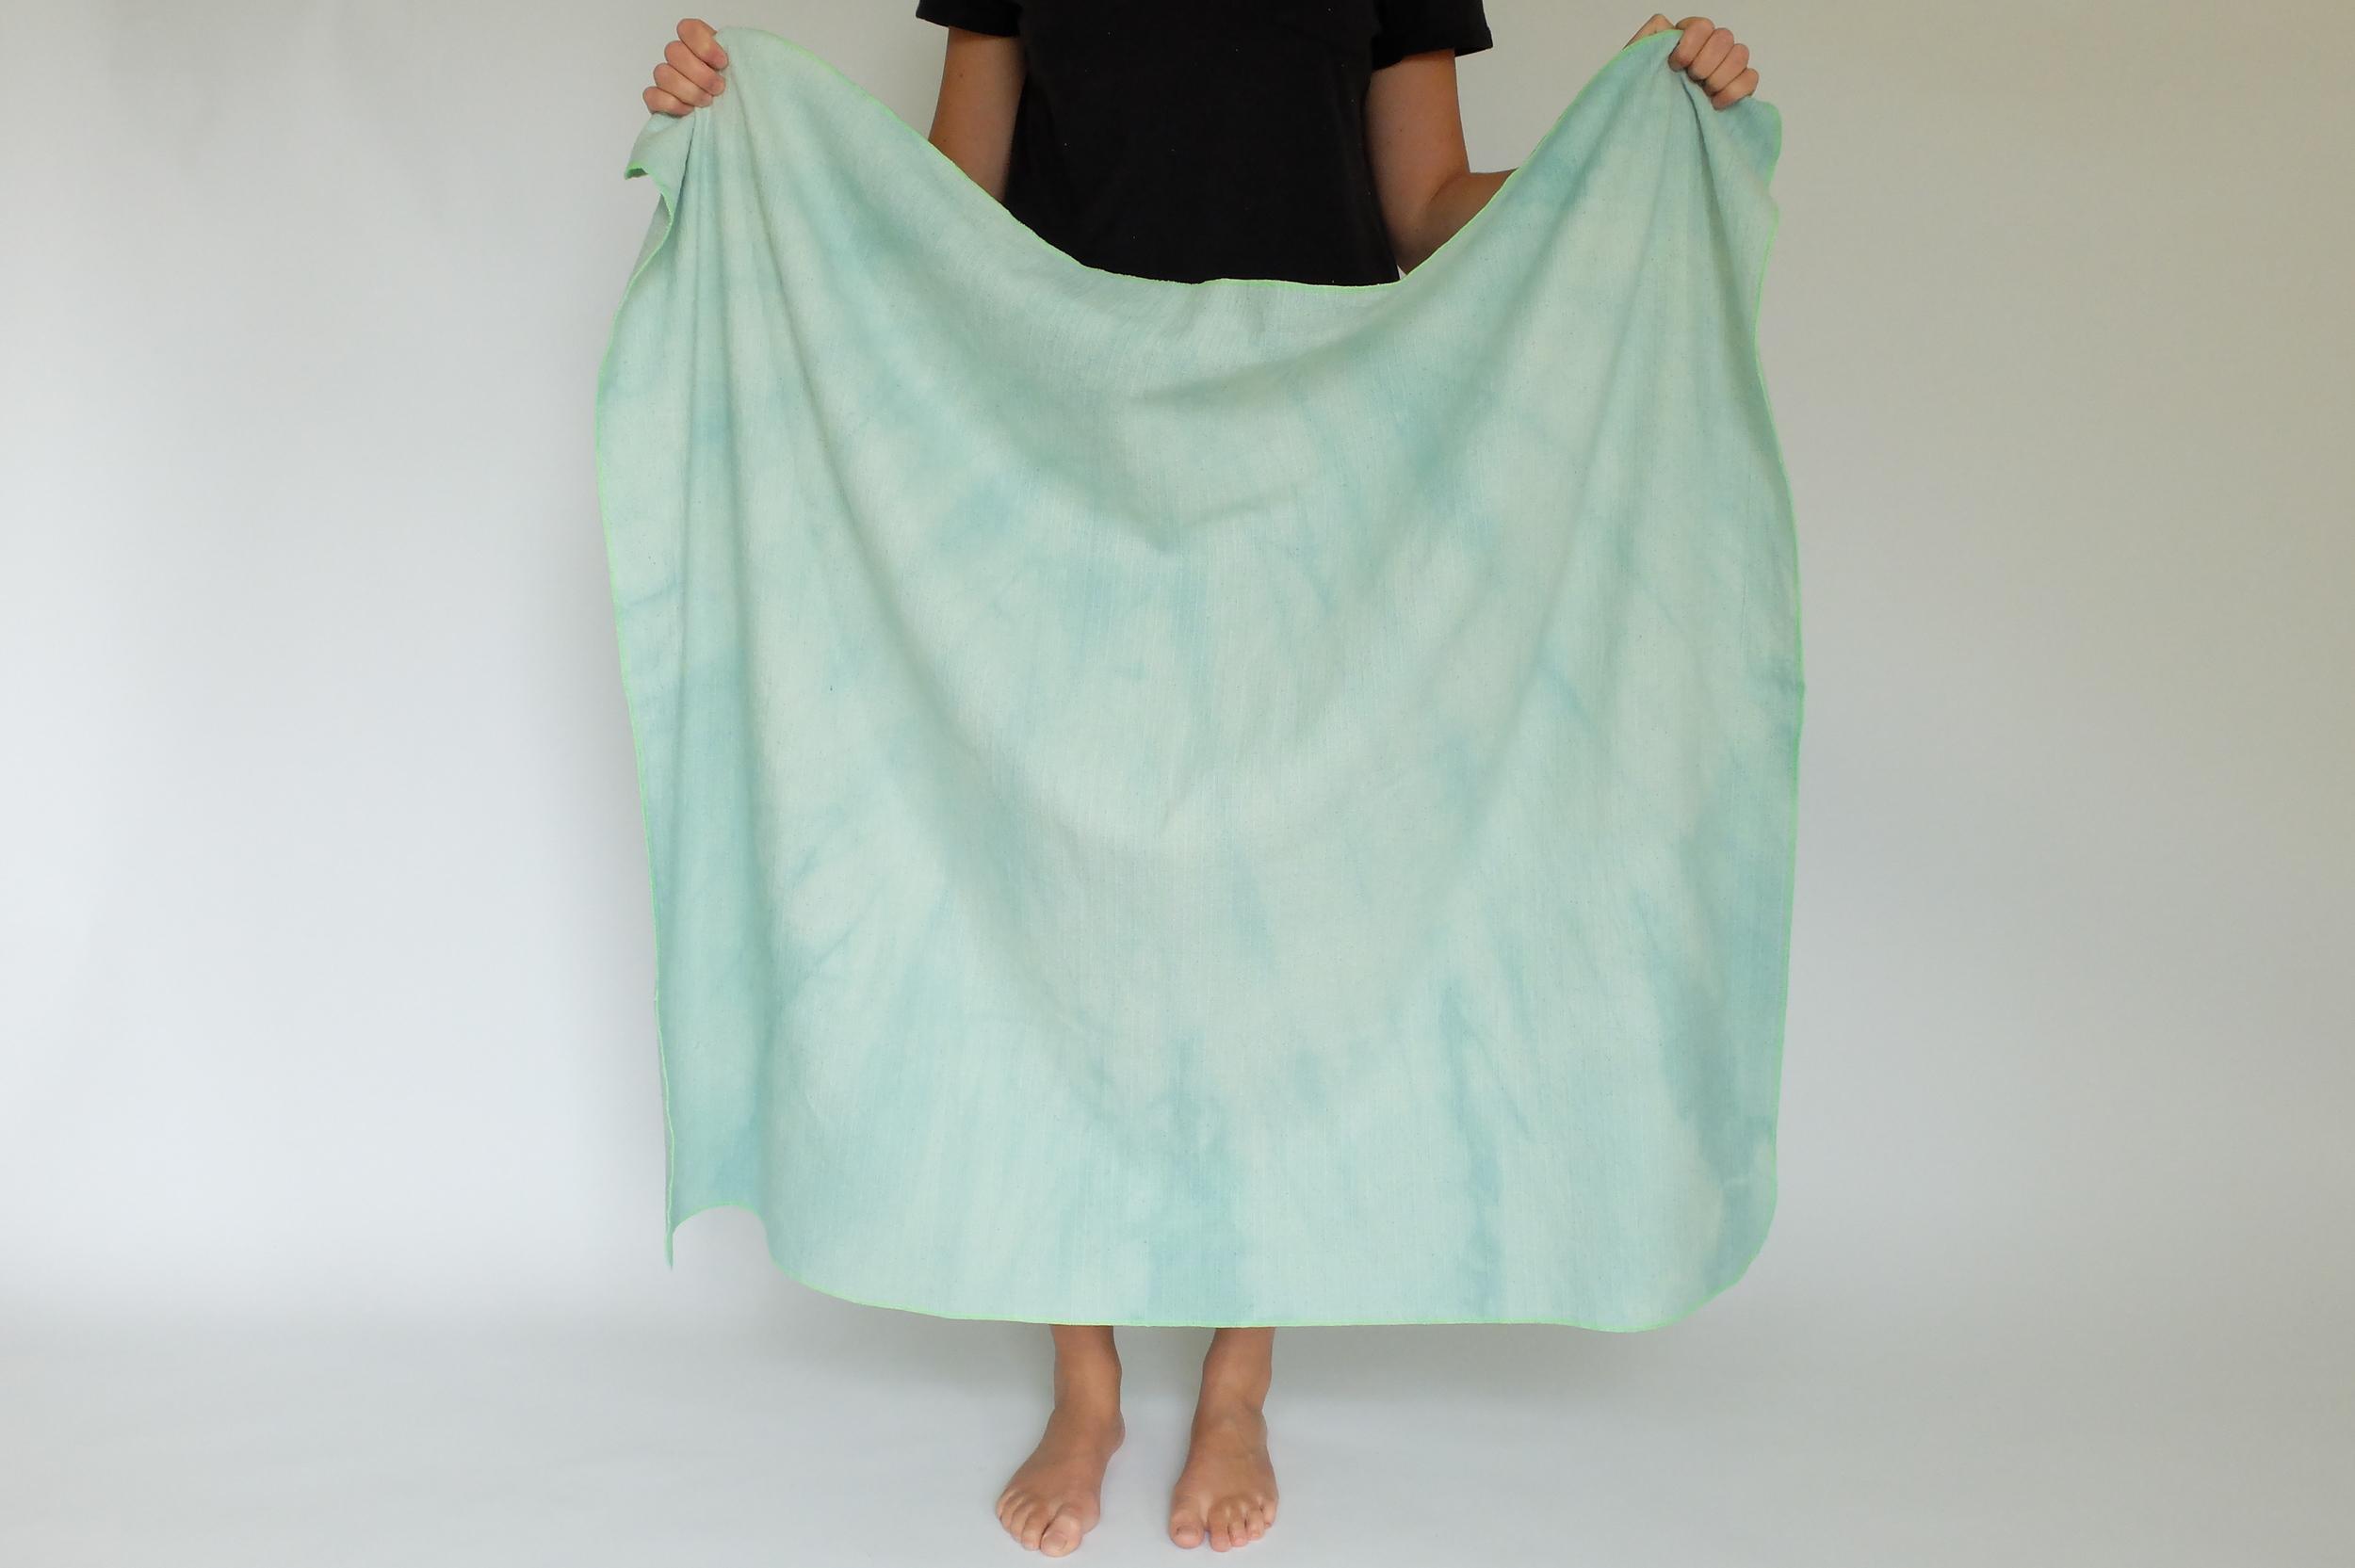 mint:green cloudy baby blanket.JPG